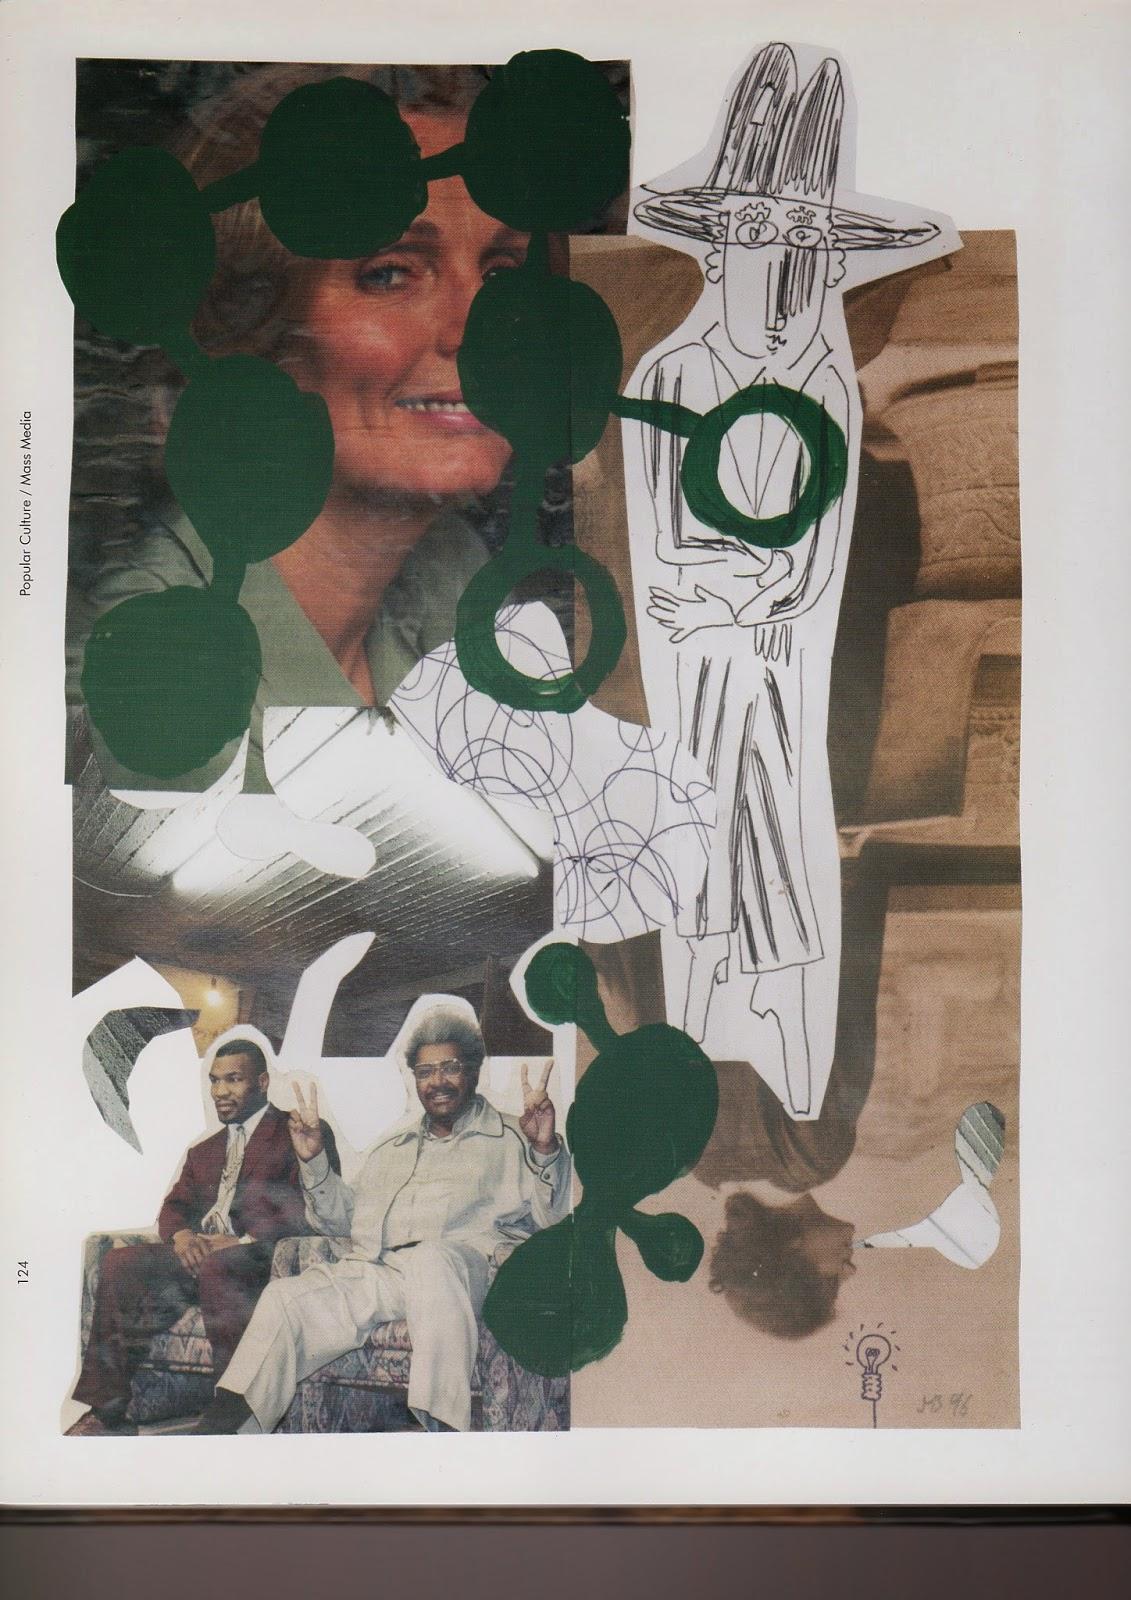 Nancy Pinkerton,Downtown Julie Brown XXX picture Margaret Ford-Taylor,Milicent Patrick